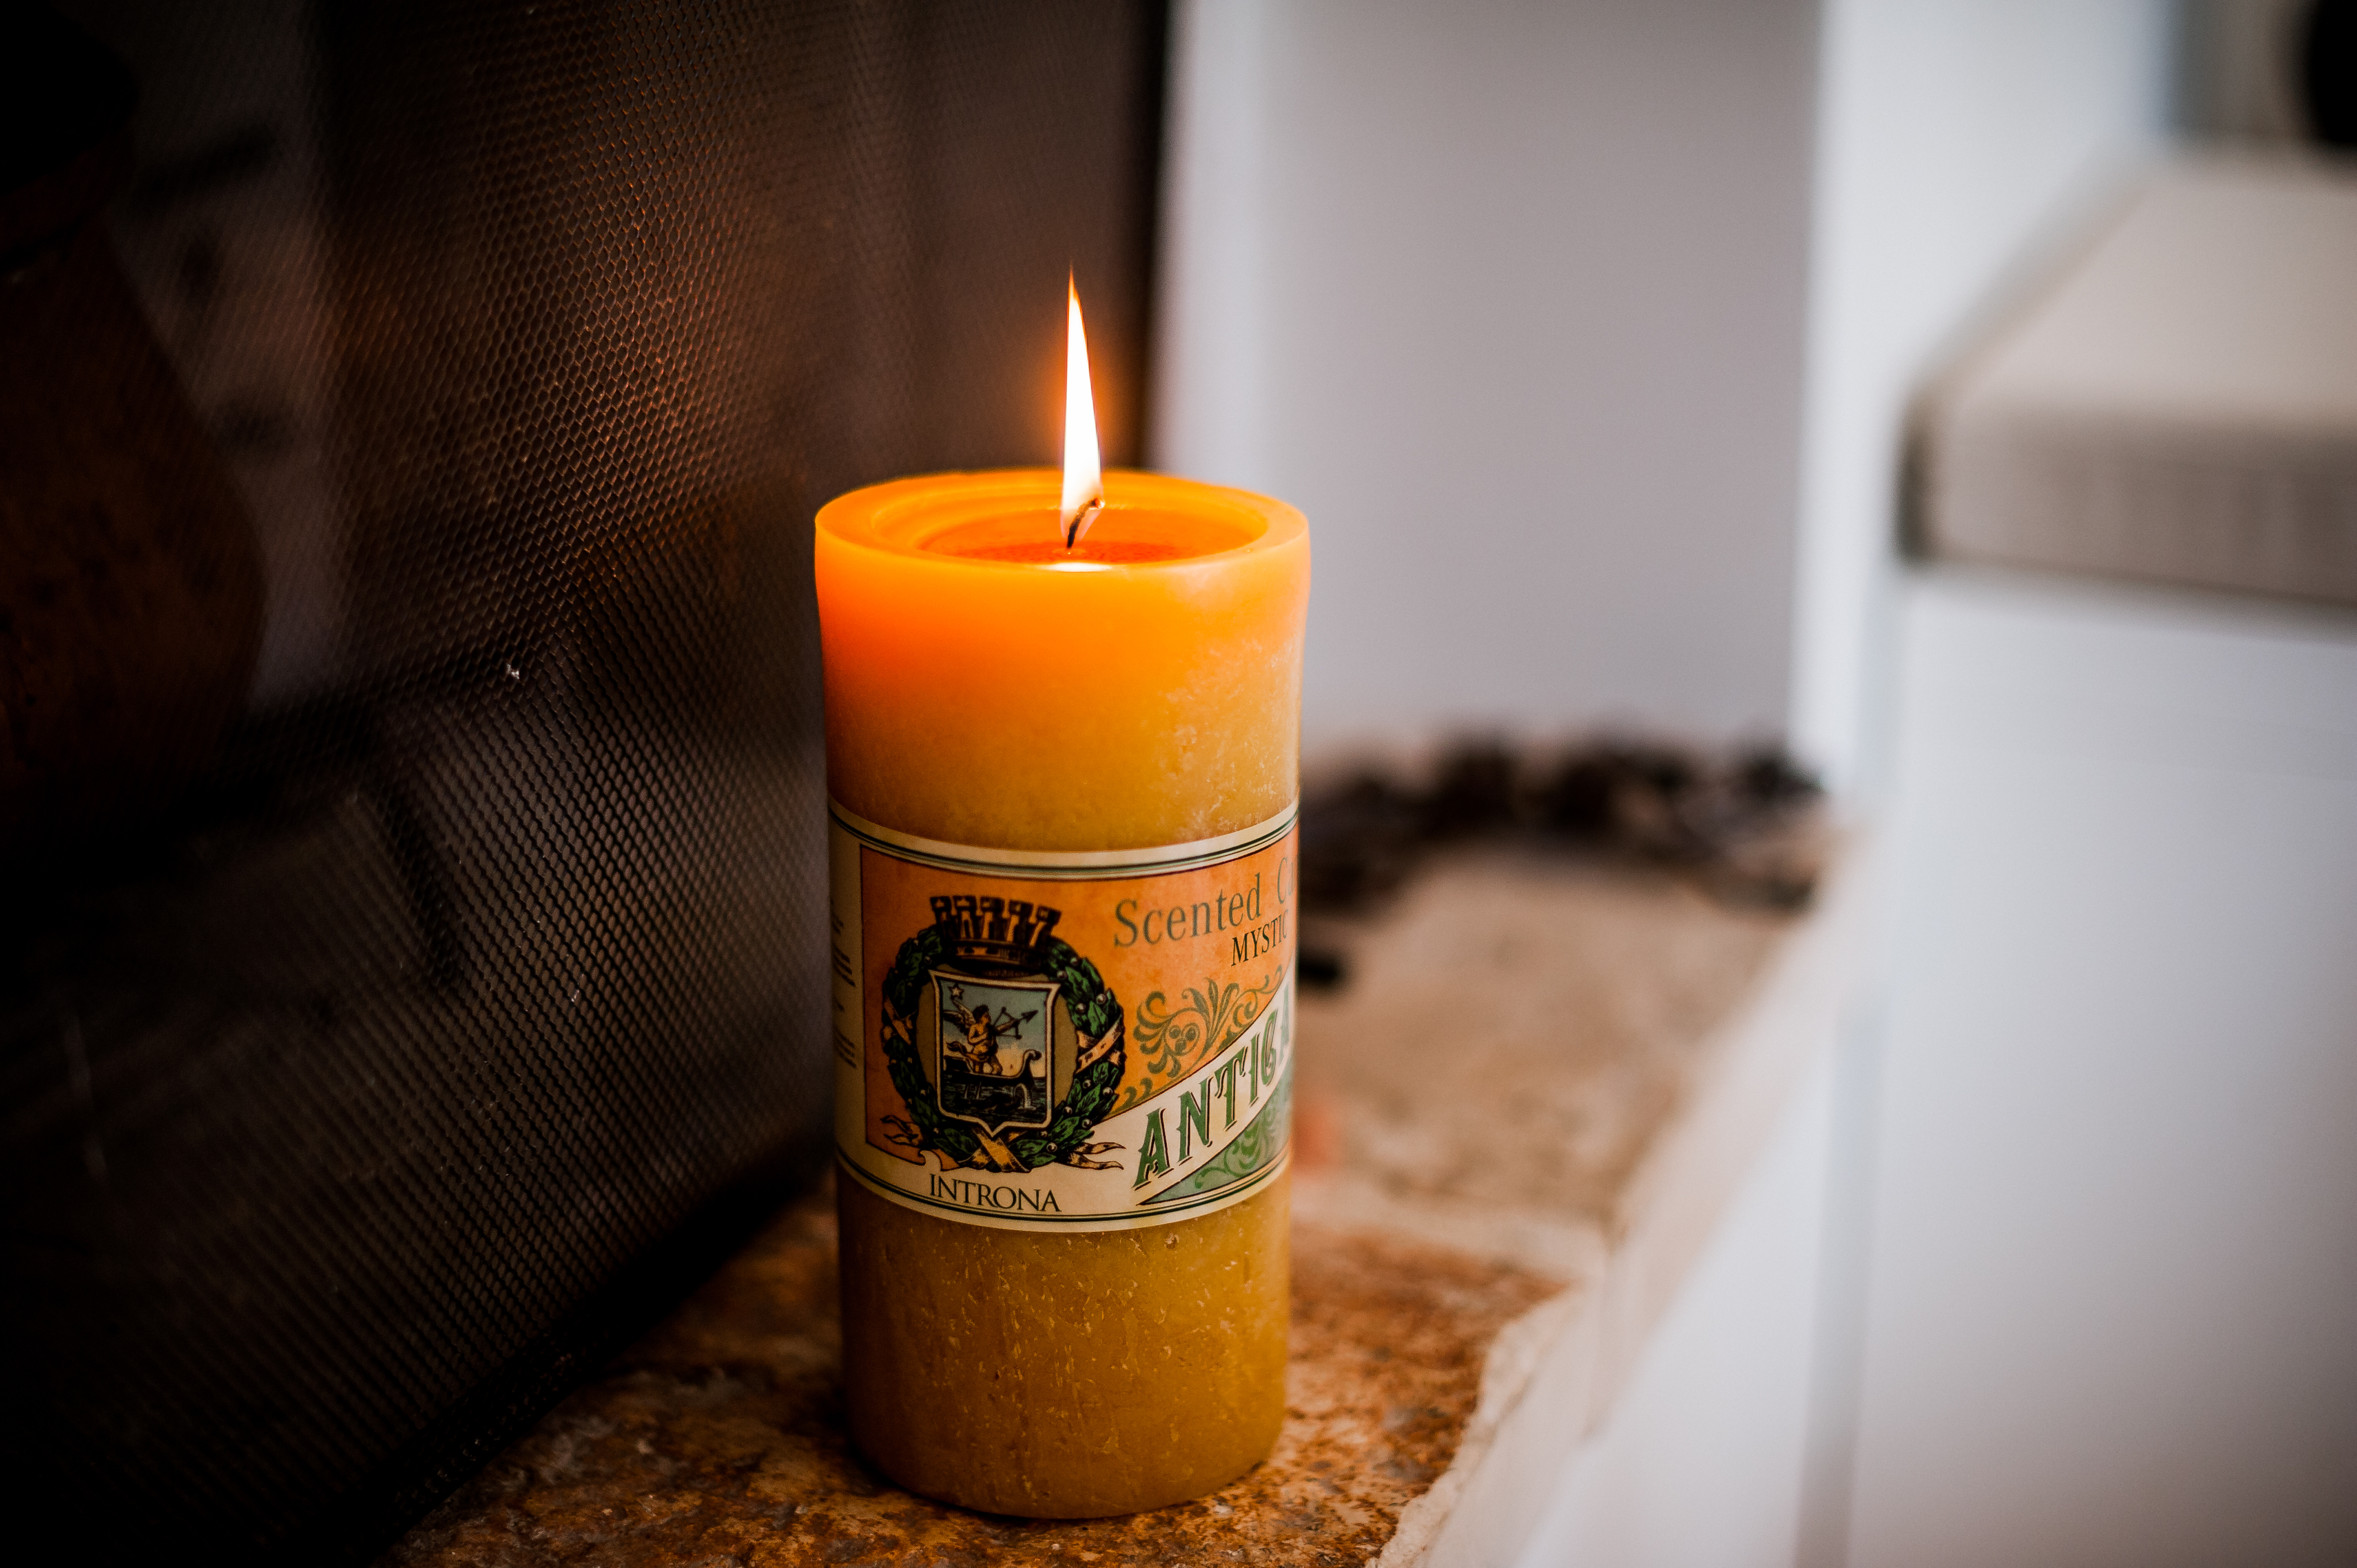 Le candele profumate creano un'atmosfera perfetta